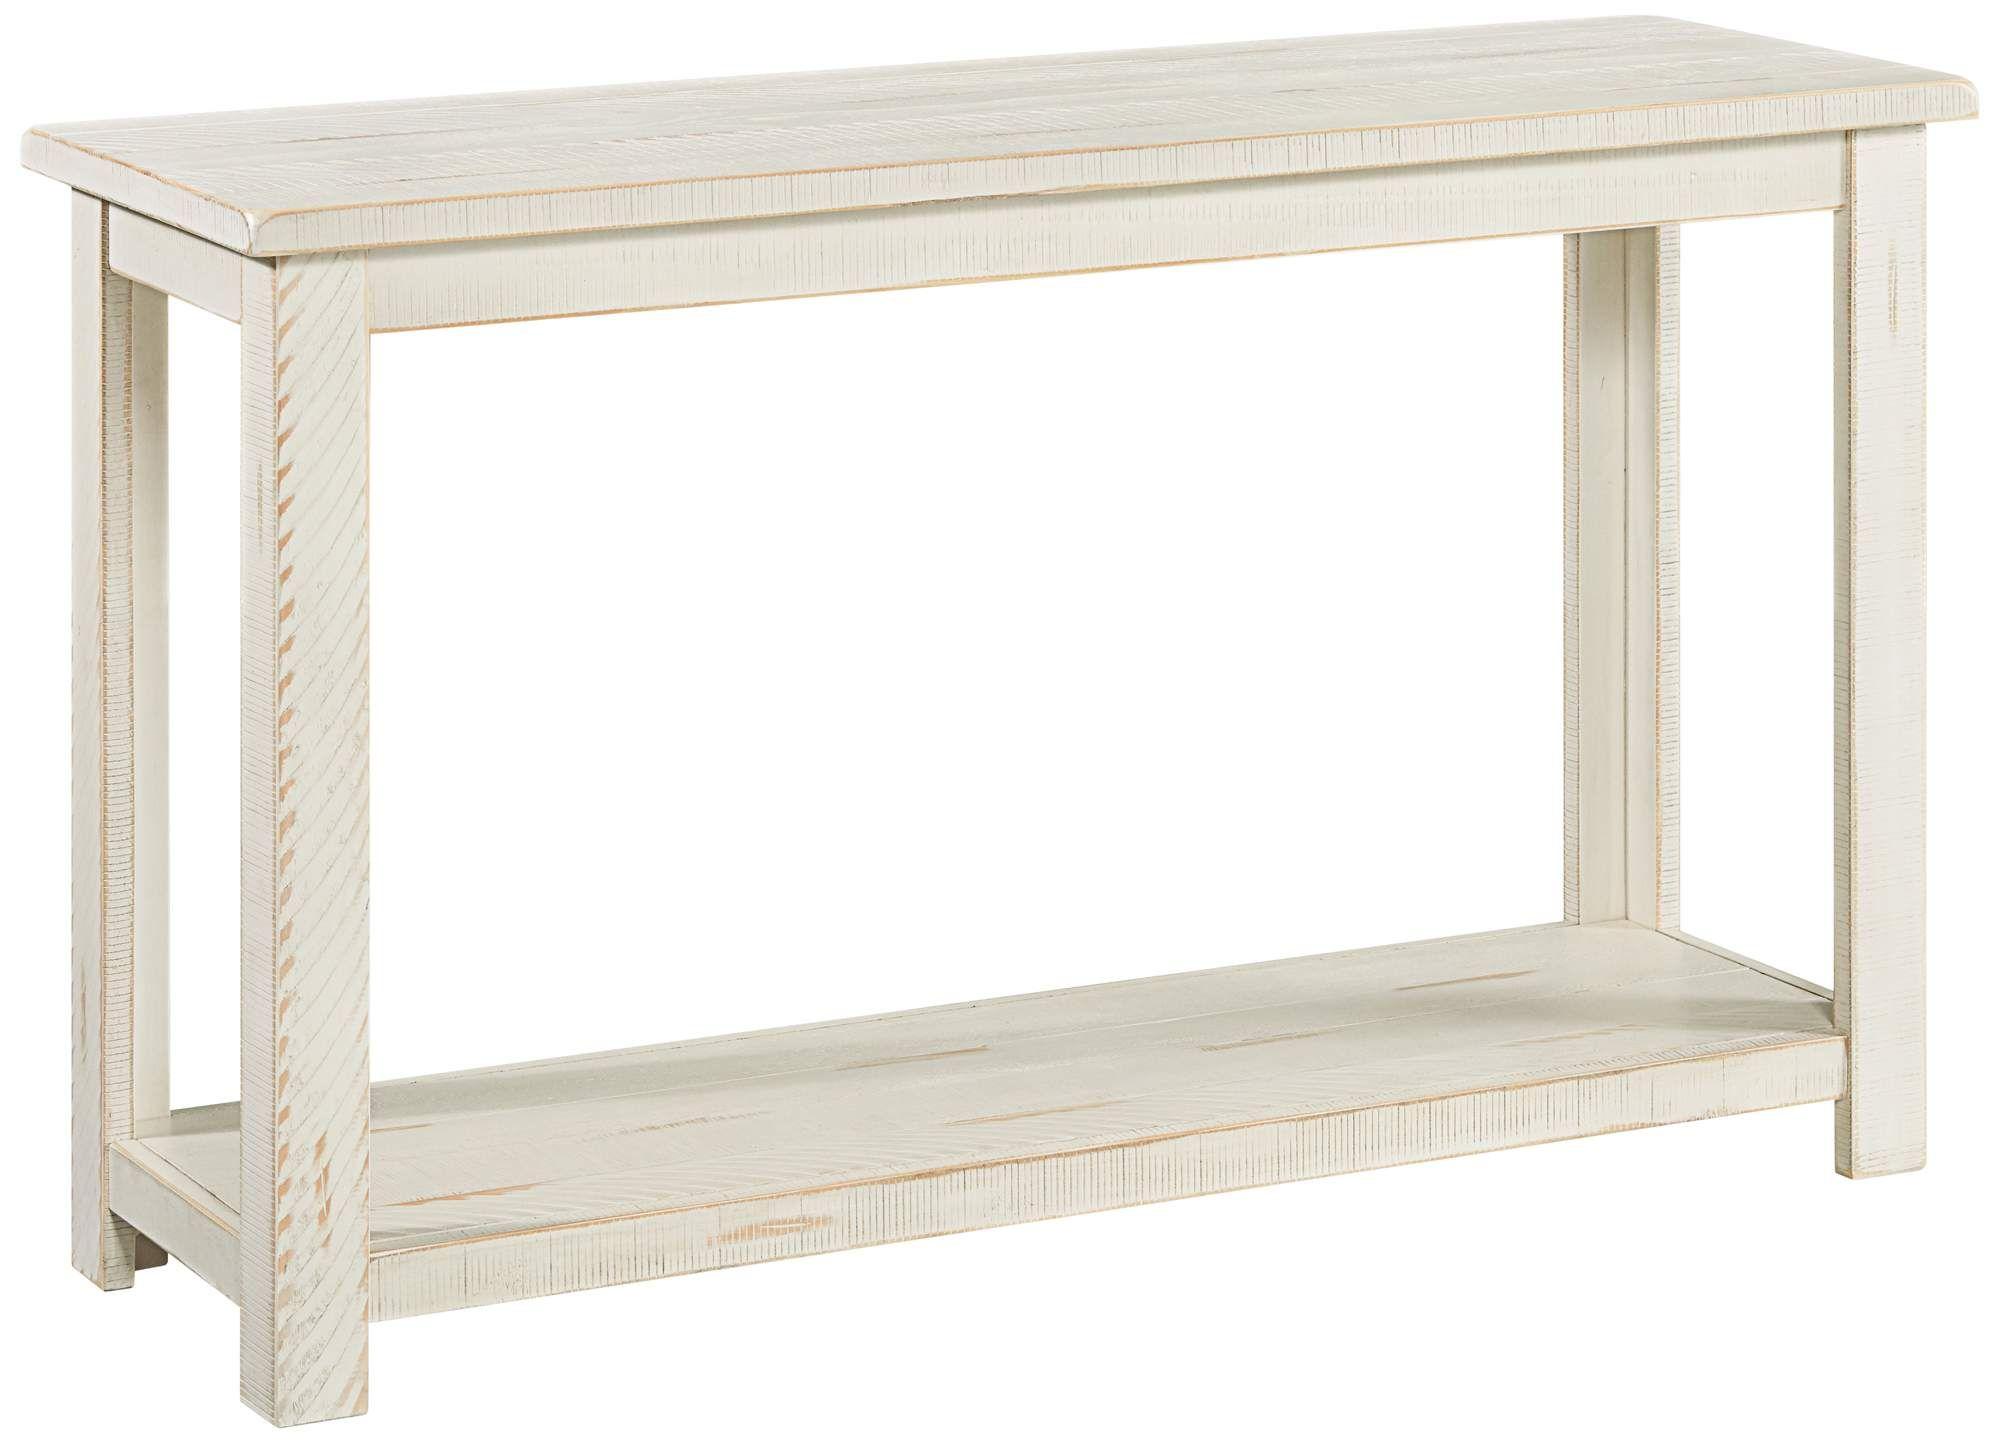 Tables Ventura 48 Wide Antique White Rectangular Wood Sofa Table In 2020 Wood Sofa Wood Sofa Table White Sofa Table